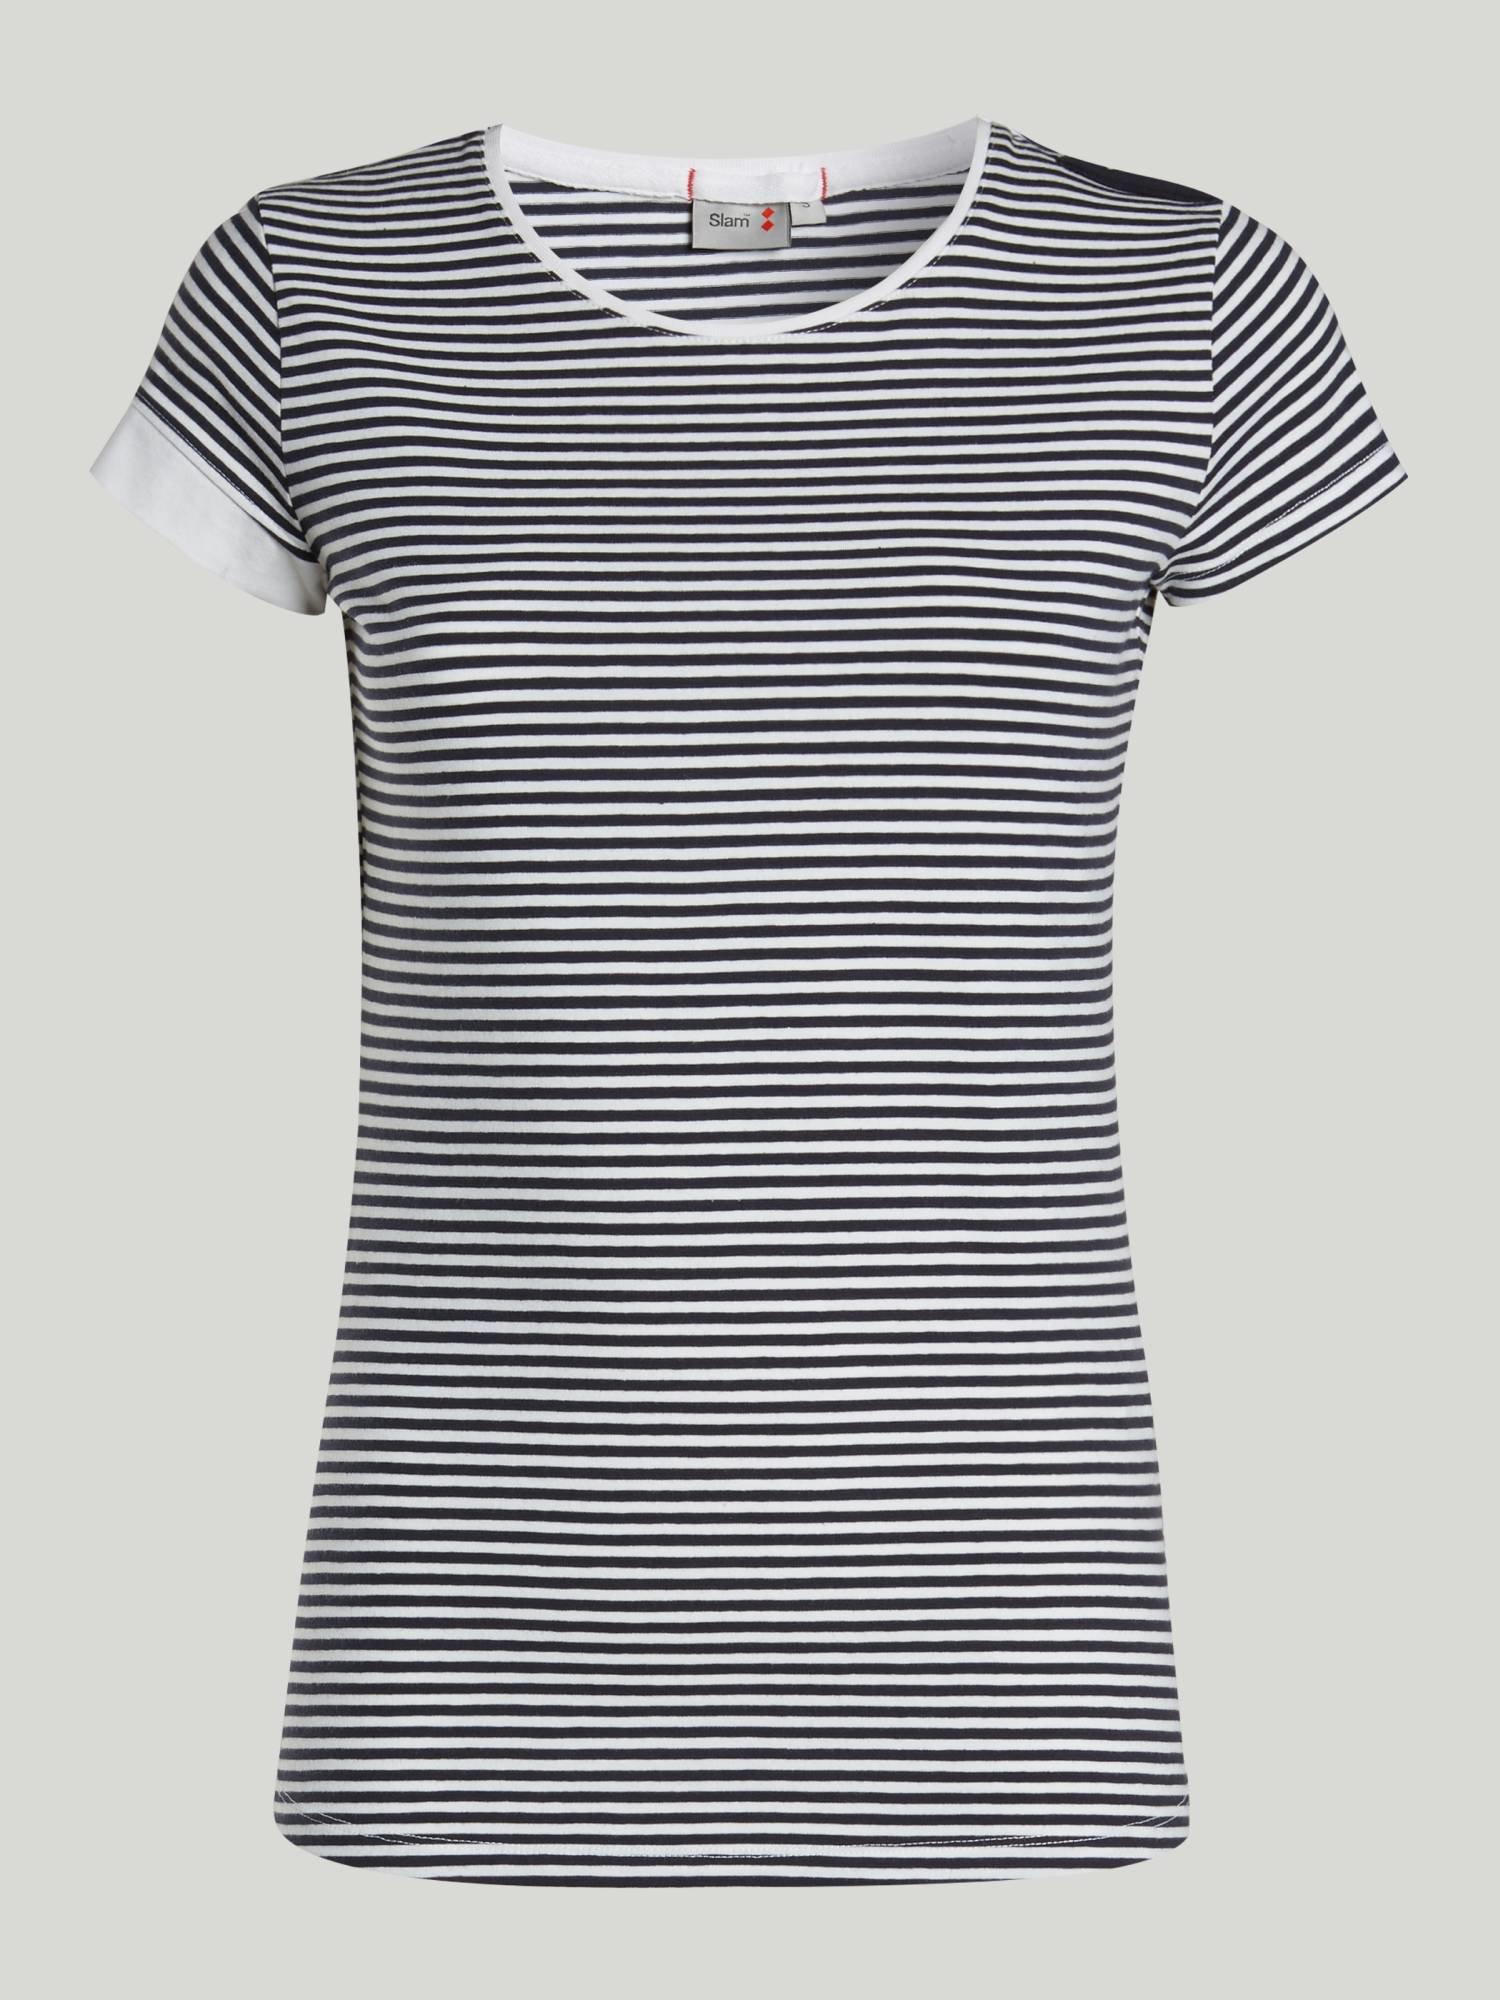 T-Shirt A119 - Navy / White